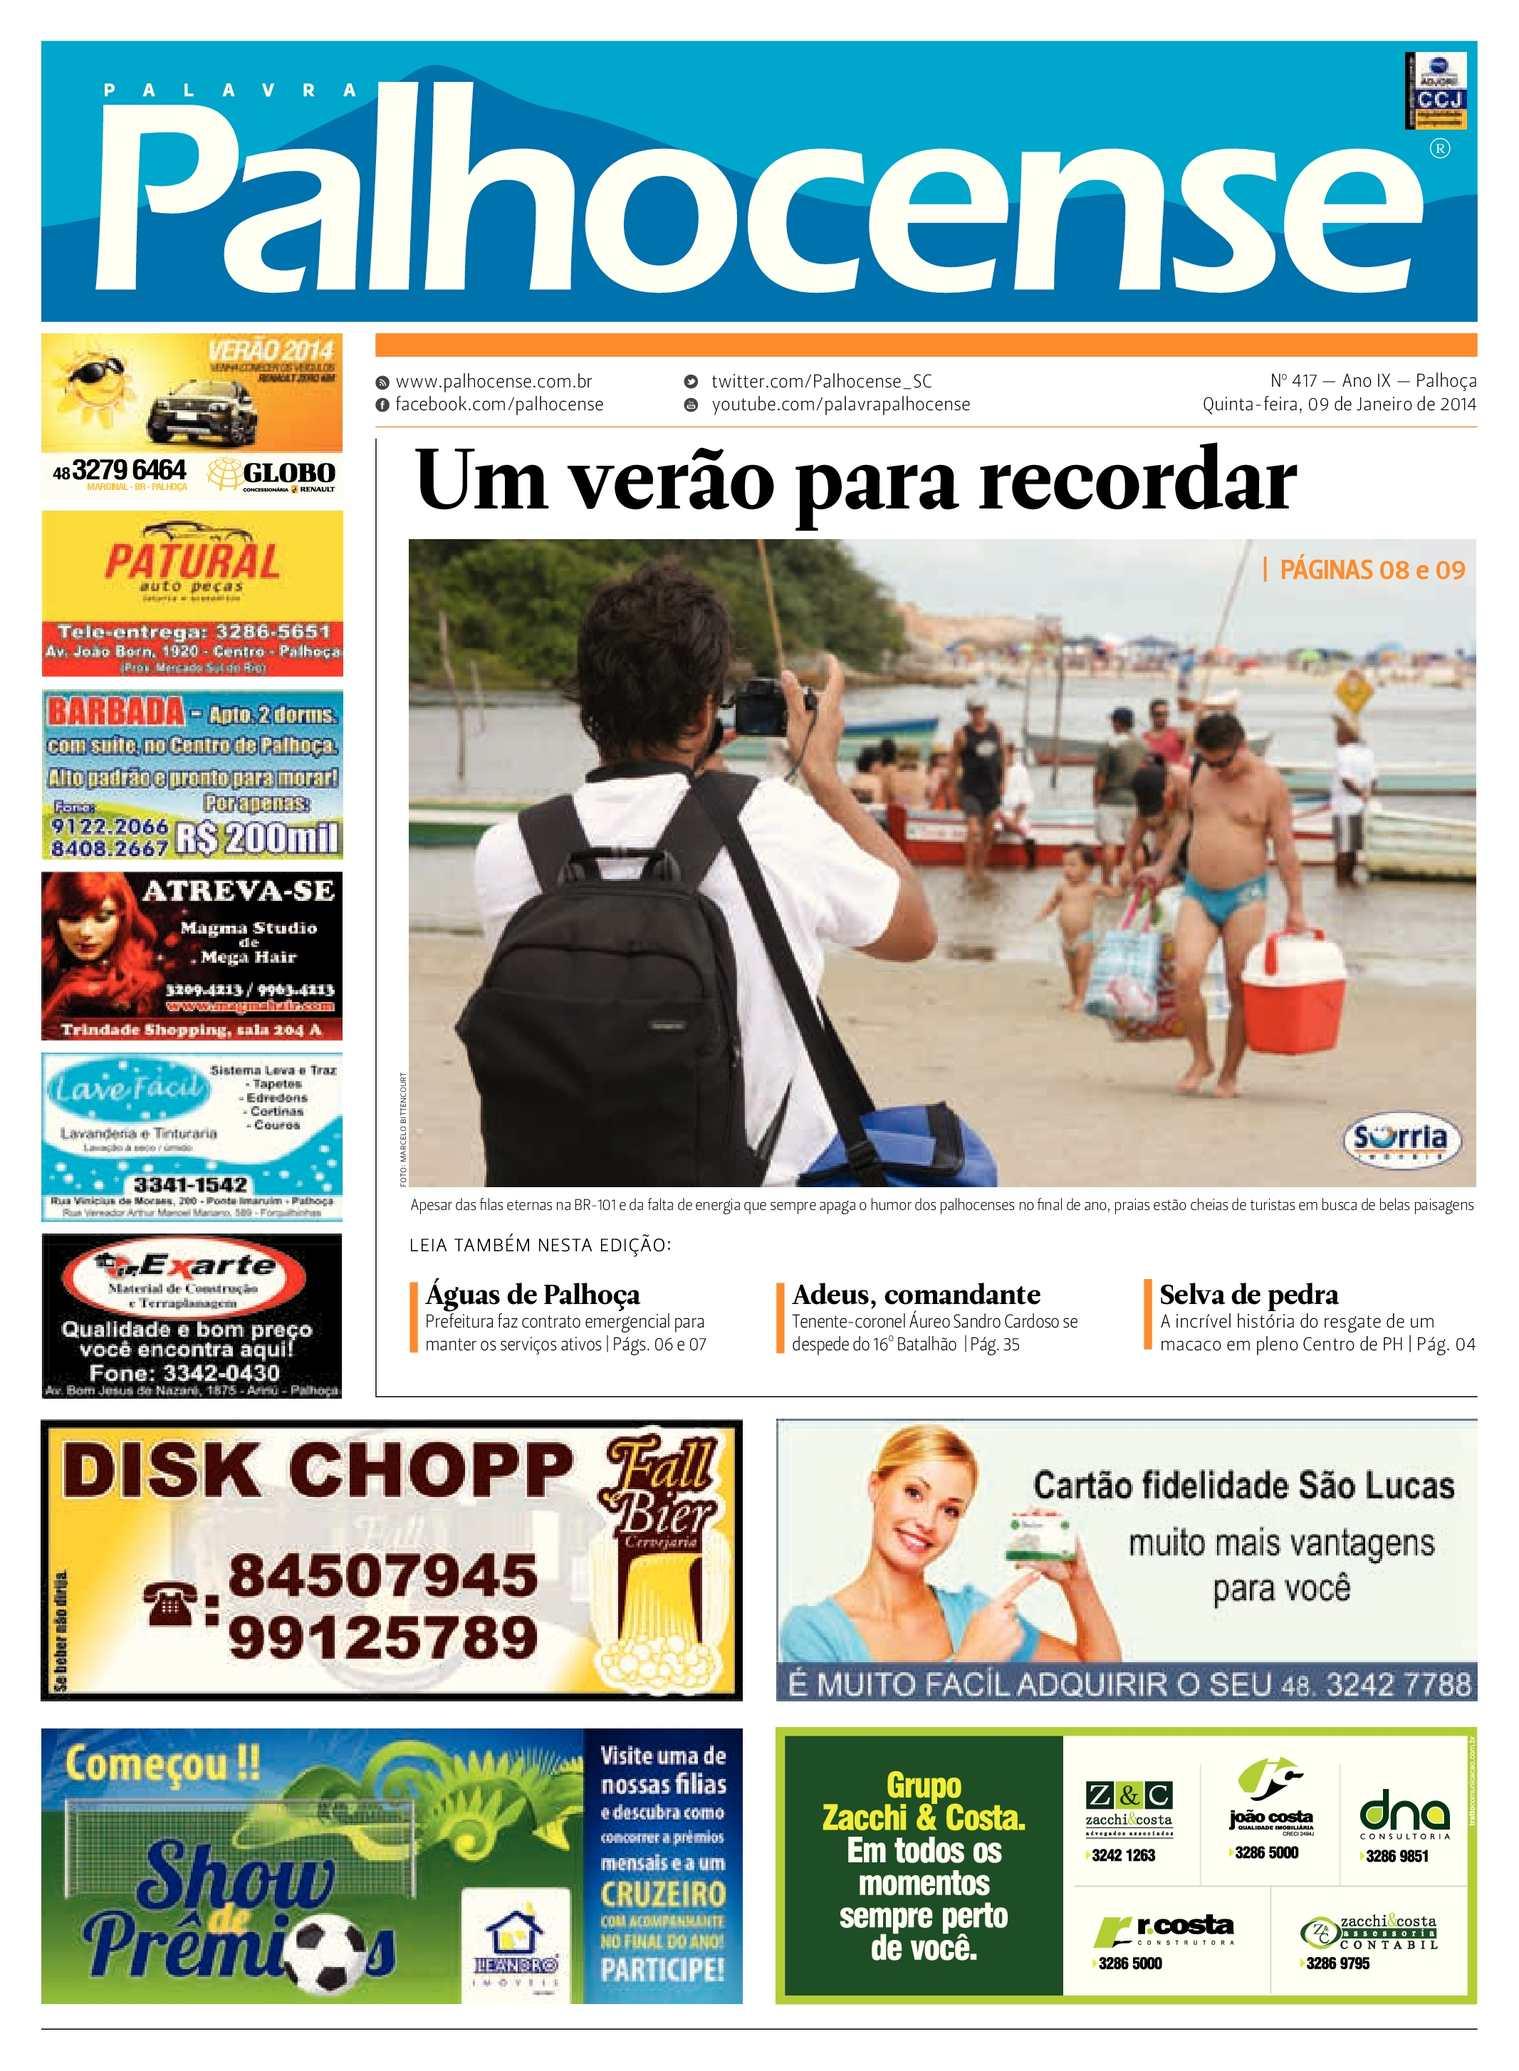 Calaméo - Jornal Palavra Palhocense - Edição 417 918a697c712ee